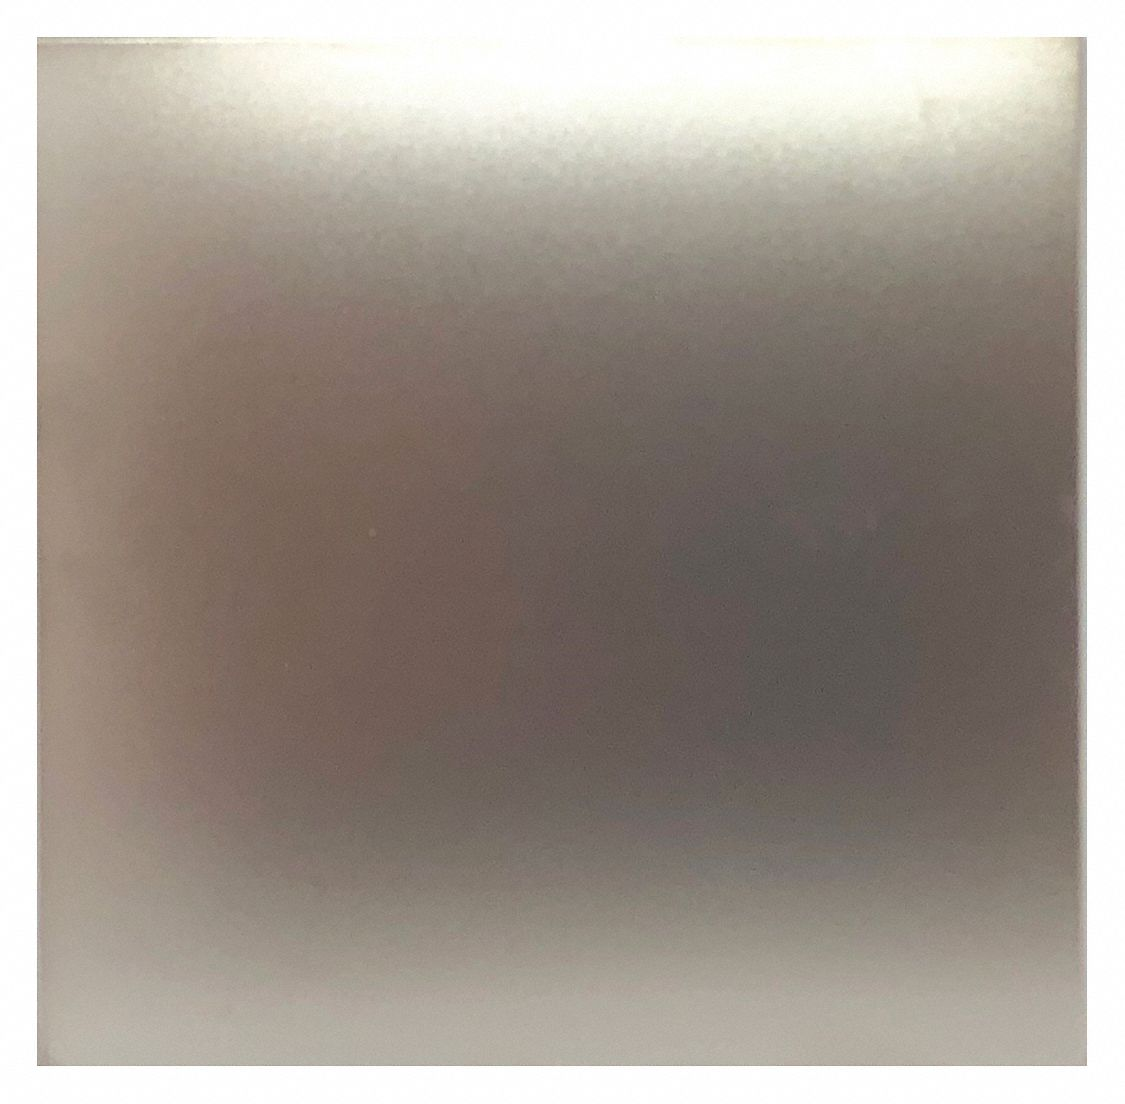 "16ga 304 2B Stainless Steel Sheet Plate  13.5/"" x 28/"""